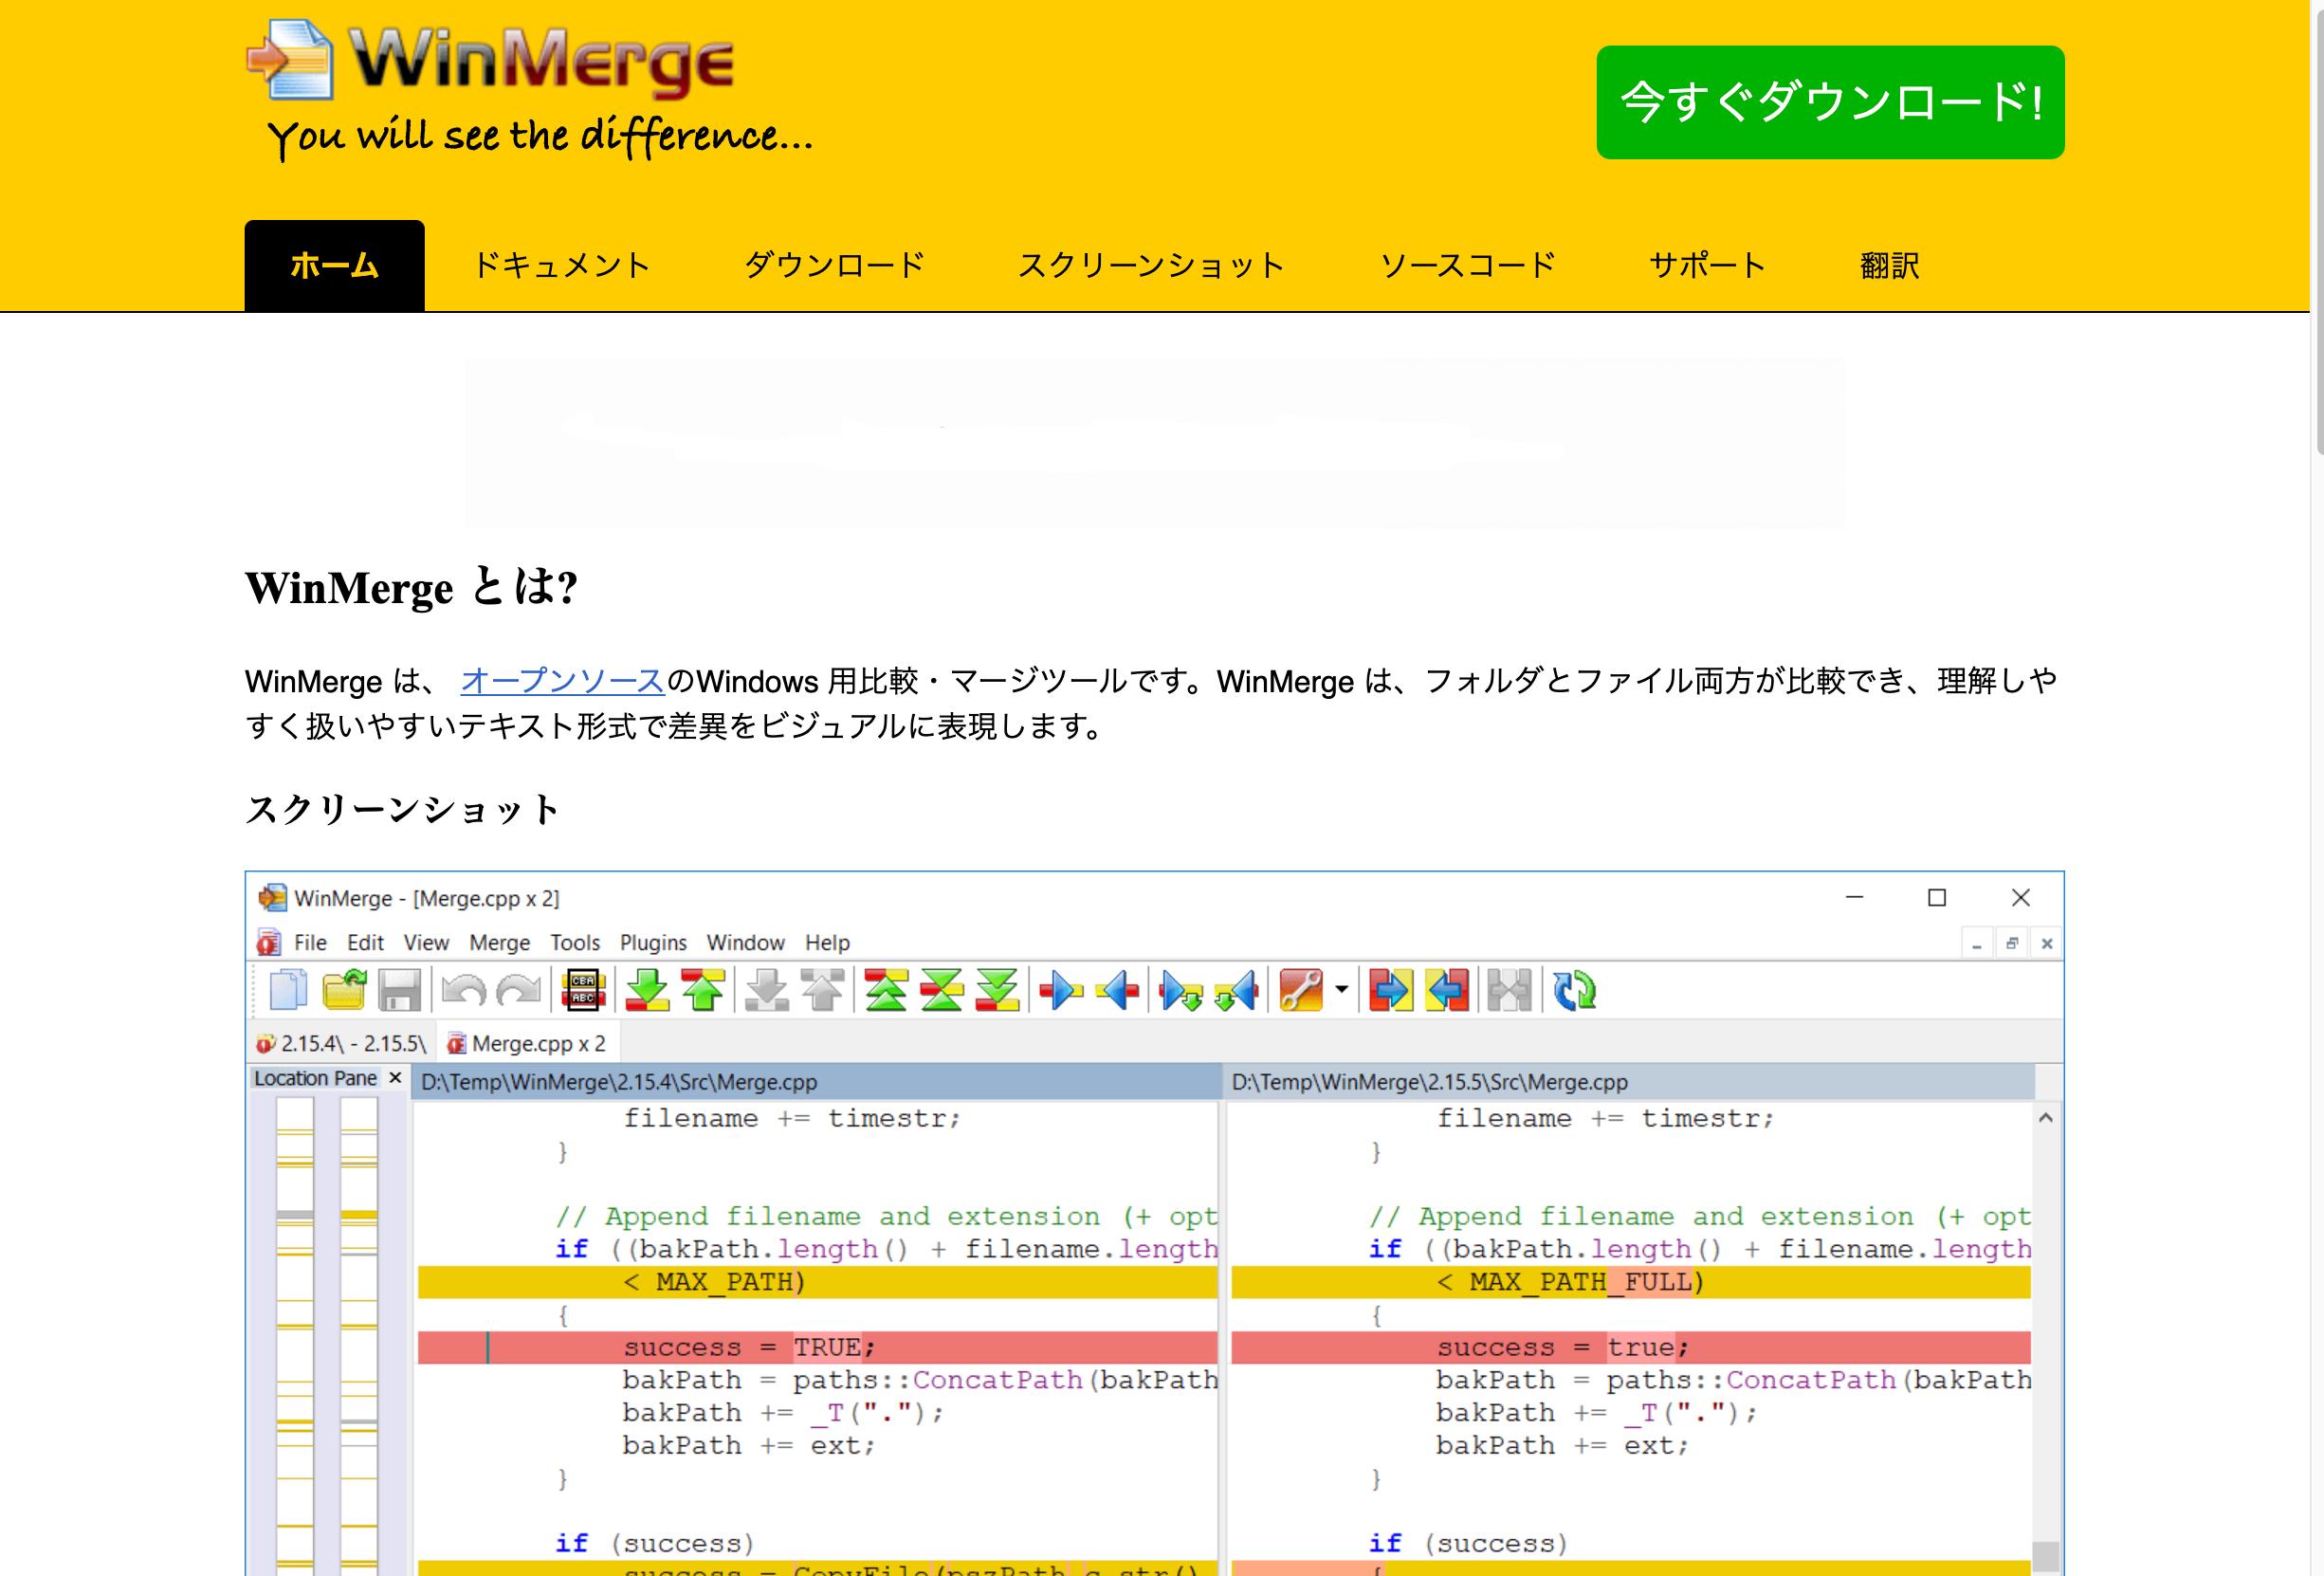 WinMerge-site